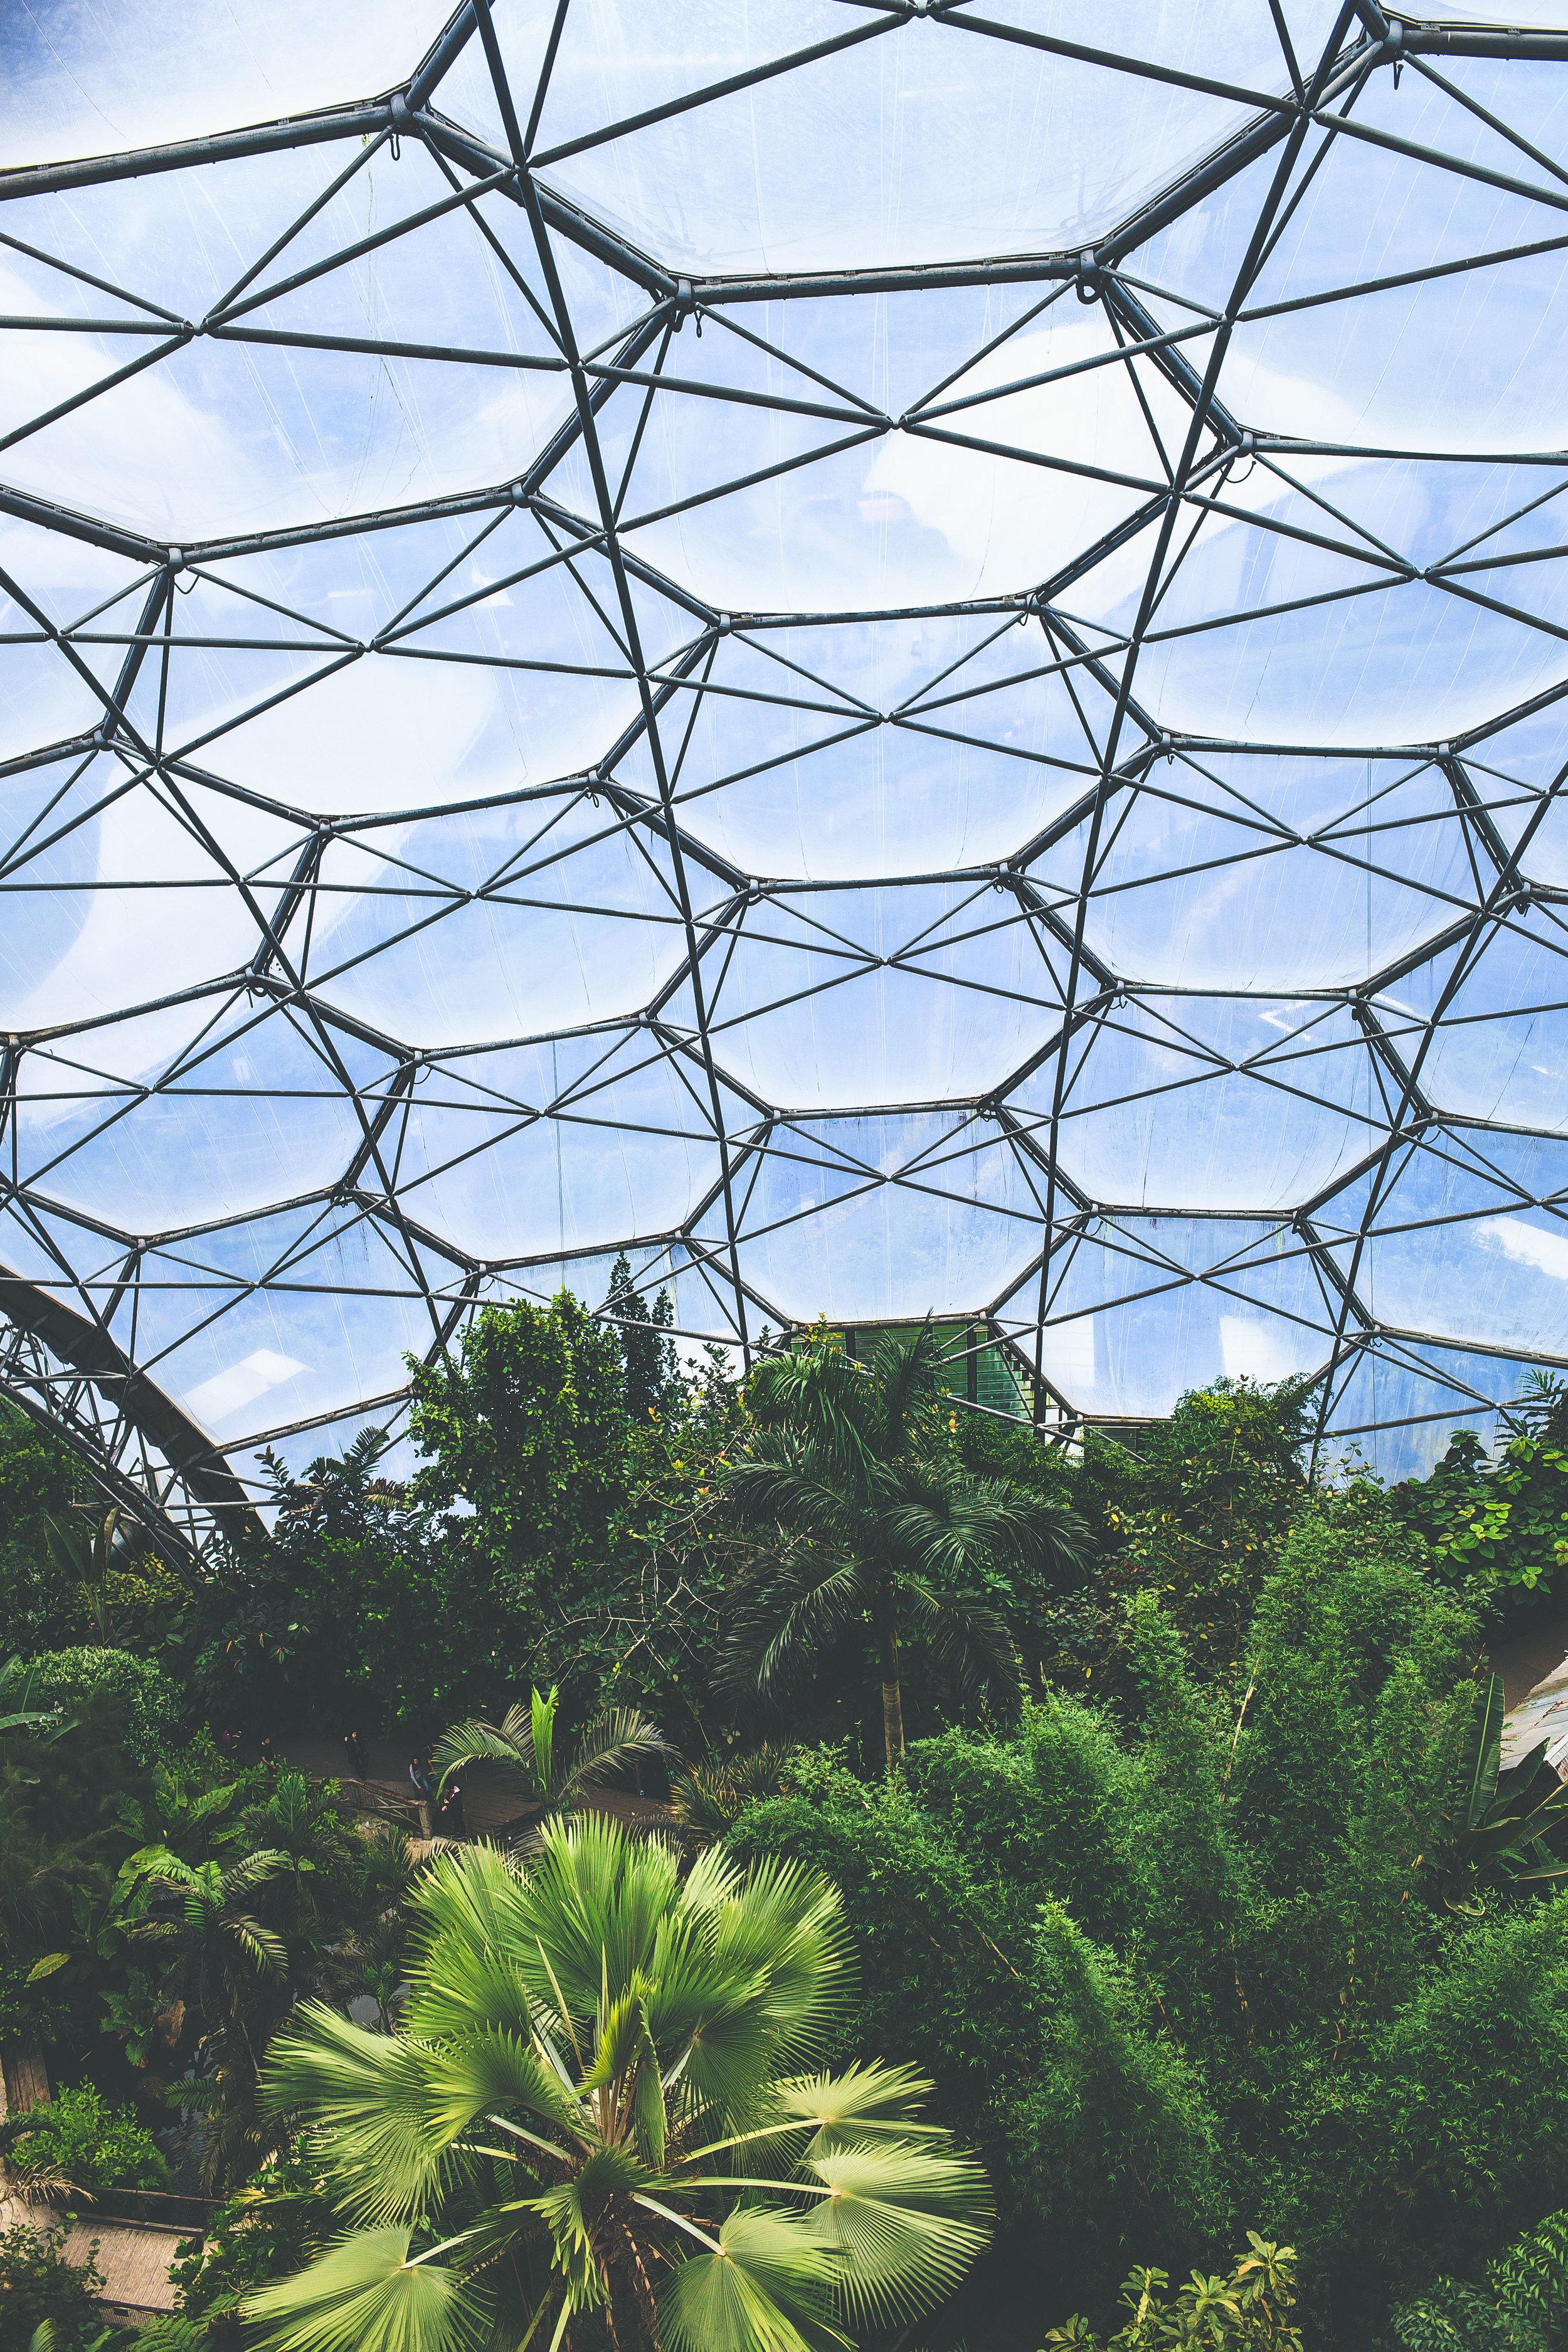 The Biodome -  Simply awe-inspiring